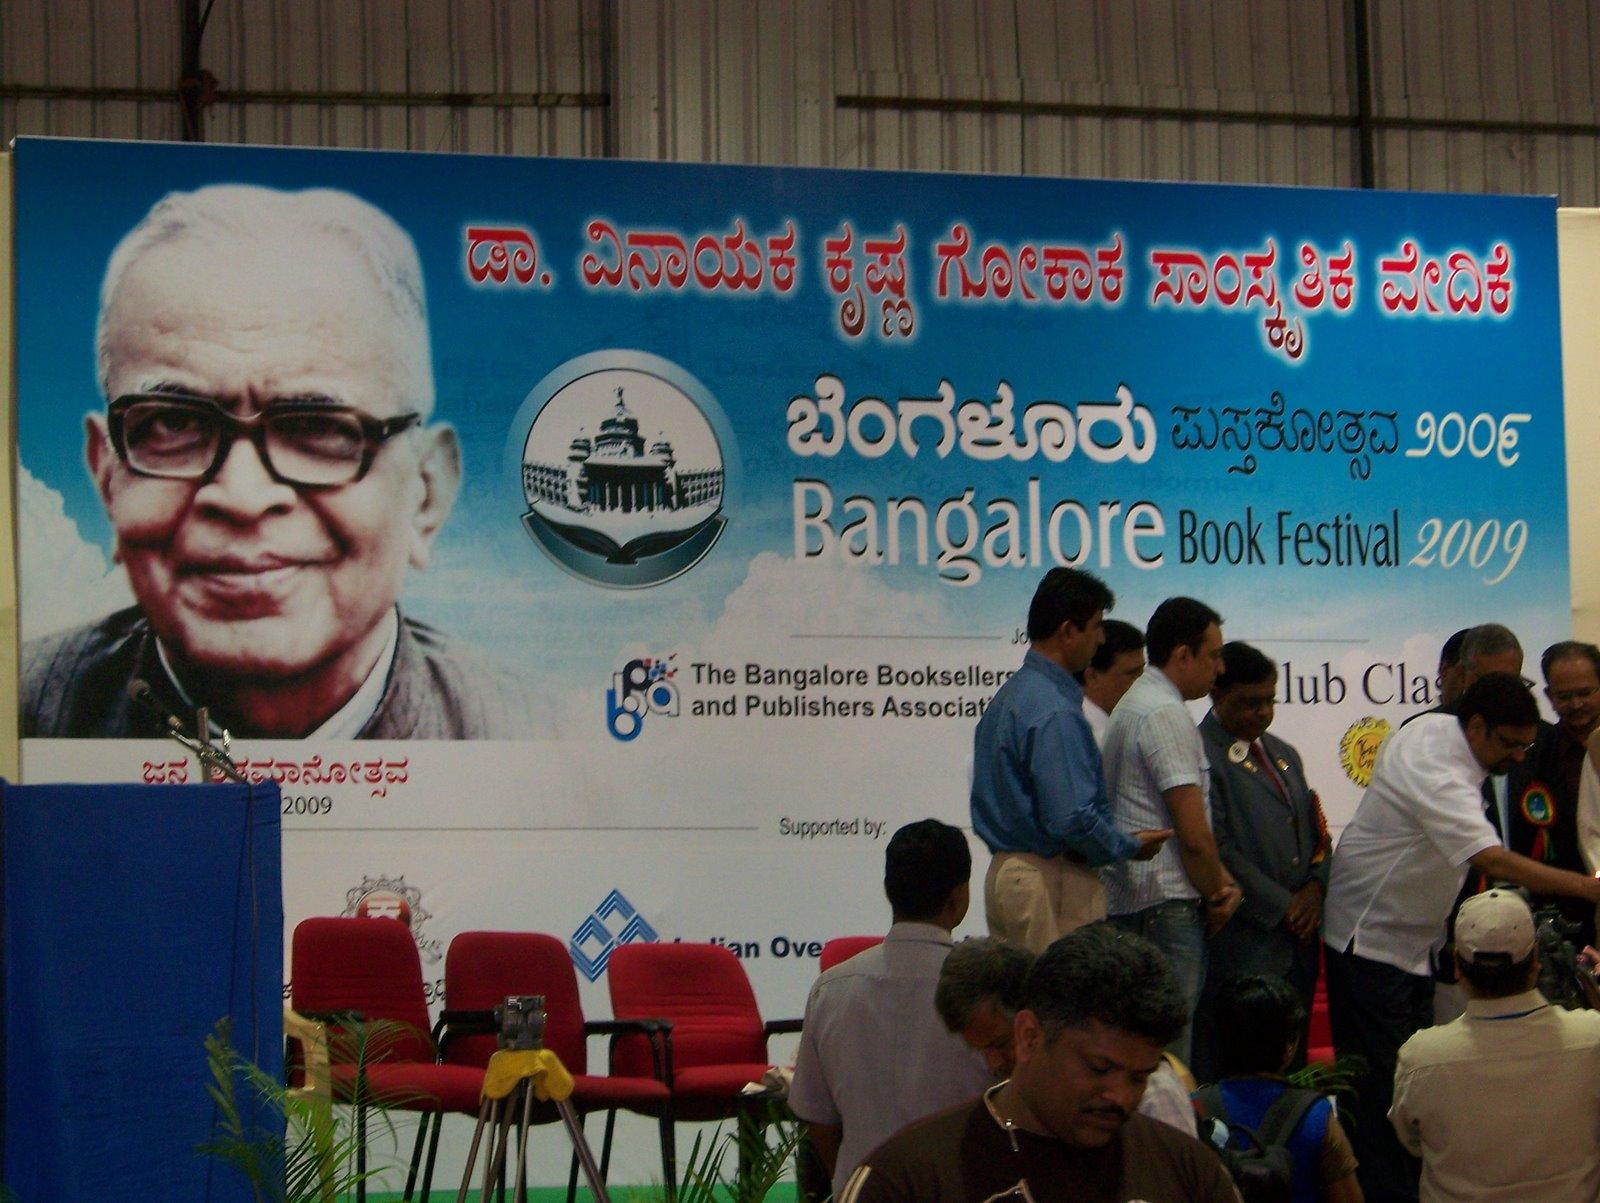 IFSC Code of STATE BANK OF INDIA  SBI      GOKAK Branch  BELGAUM    Vinayaka Krishna Gokak